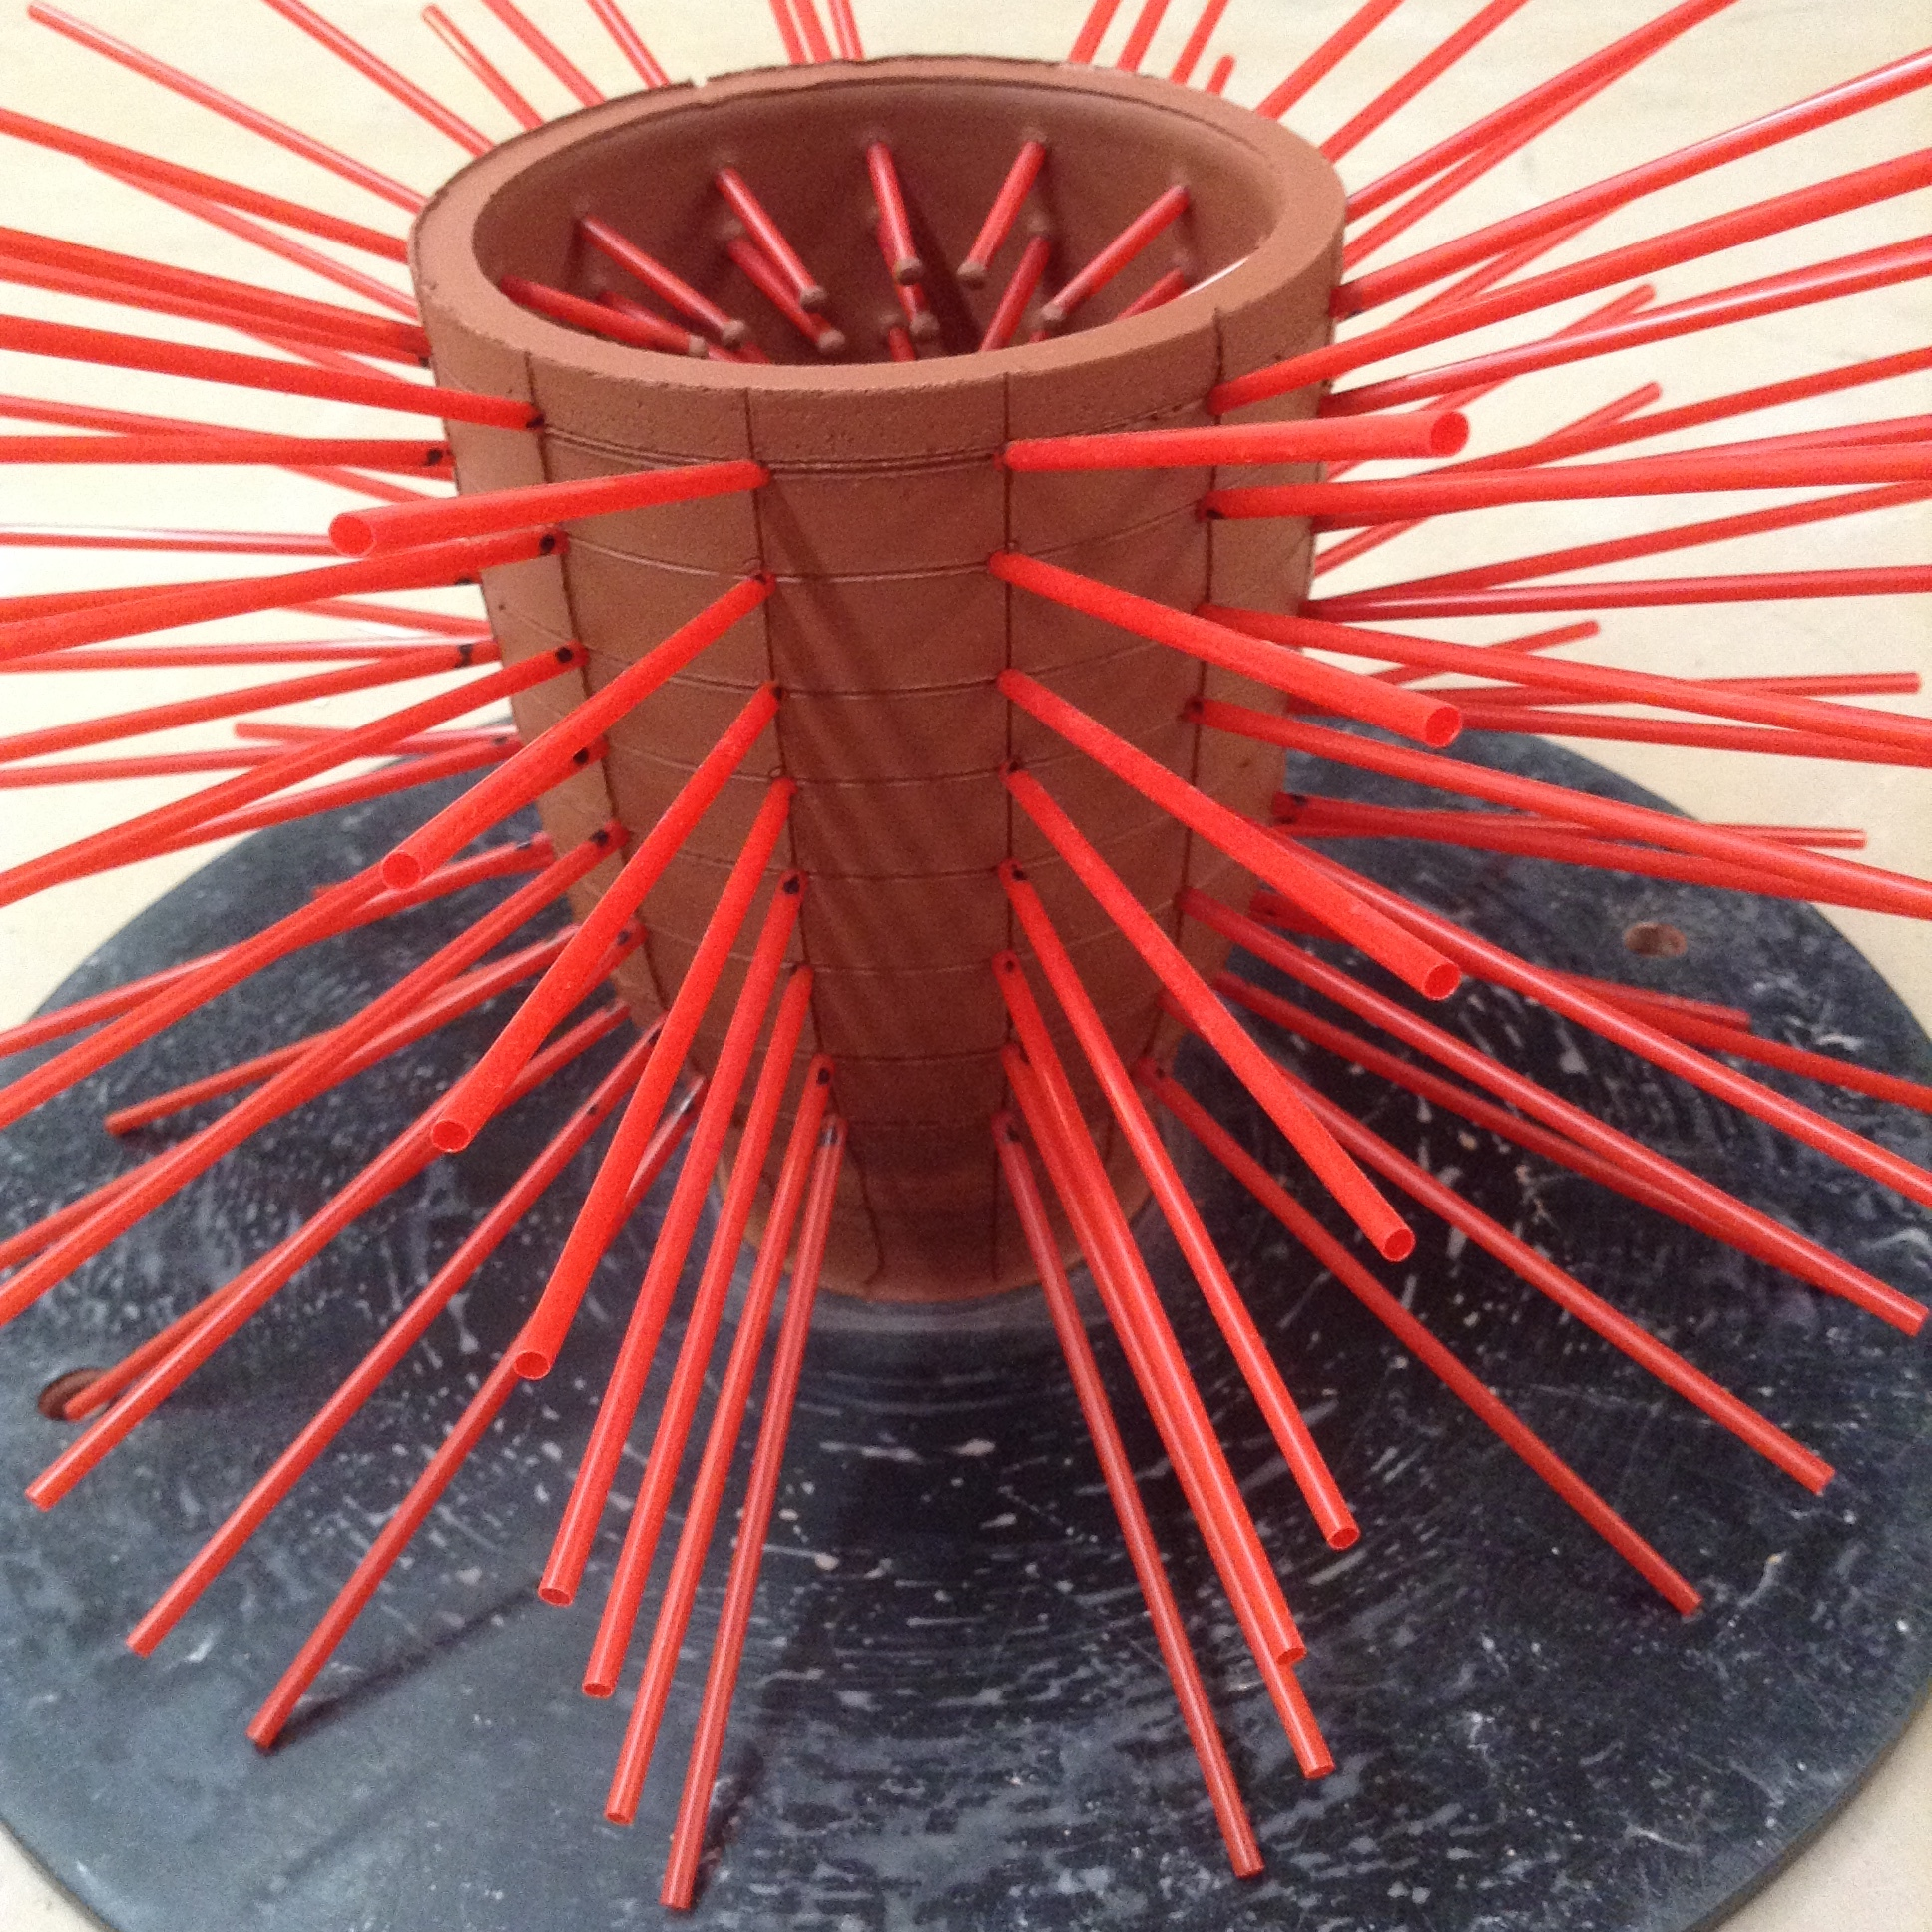 cone straw install process.JPG